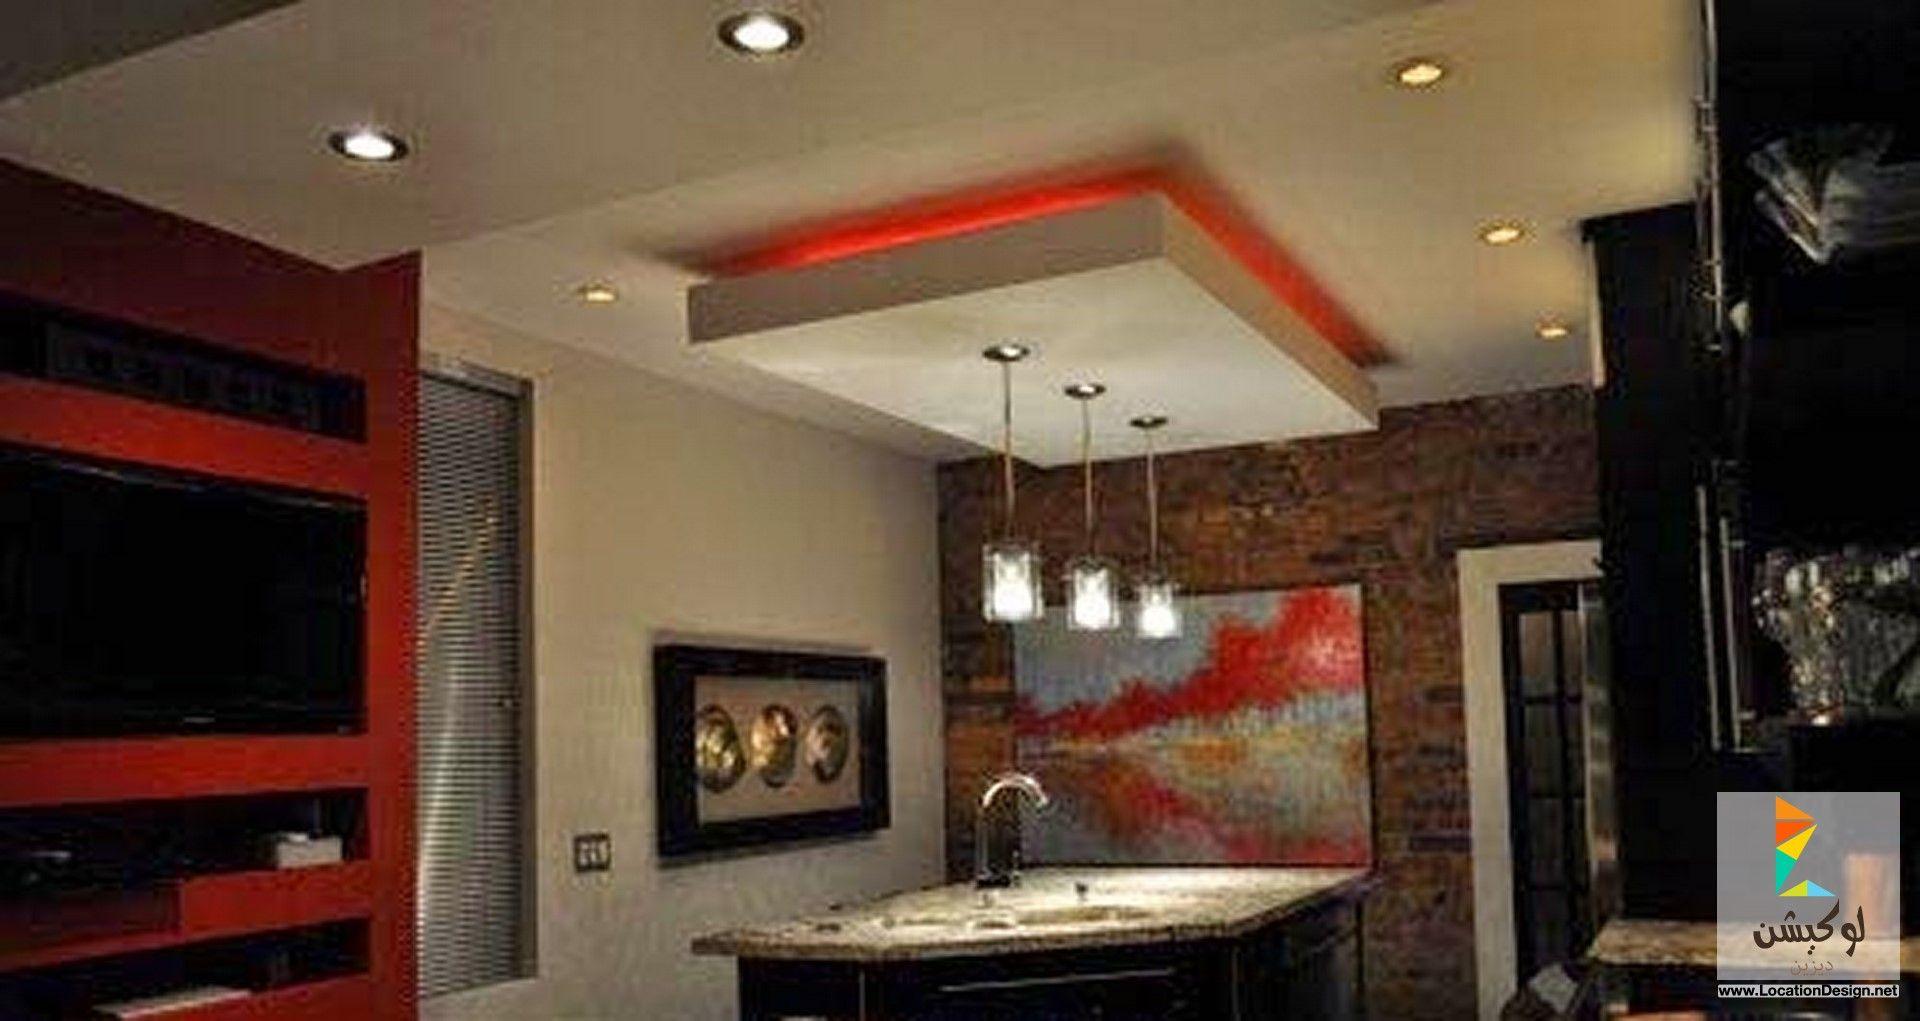 Faux Plafond Suspendu Cuisine انارة اسقف جبس 2015 | plasterboard | ceiling design, ceiling